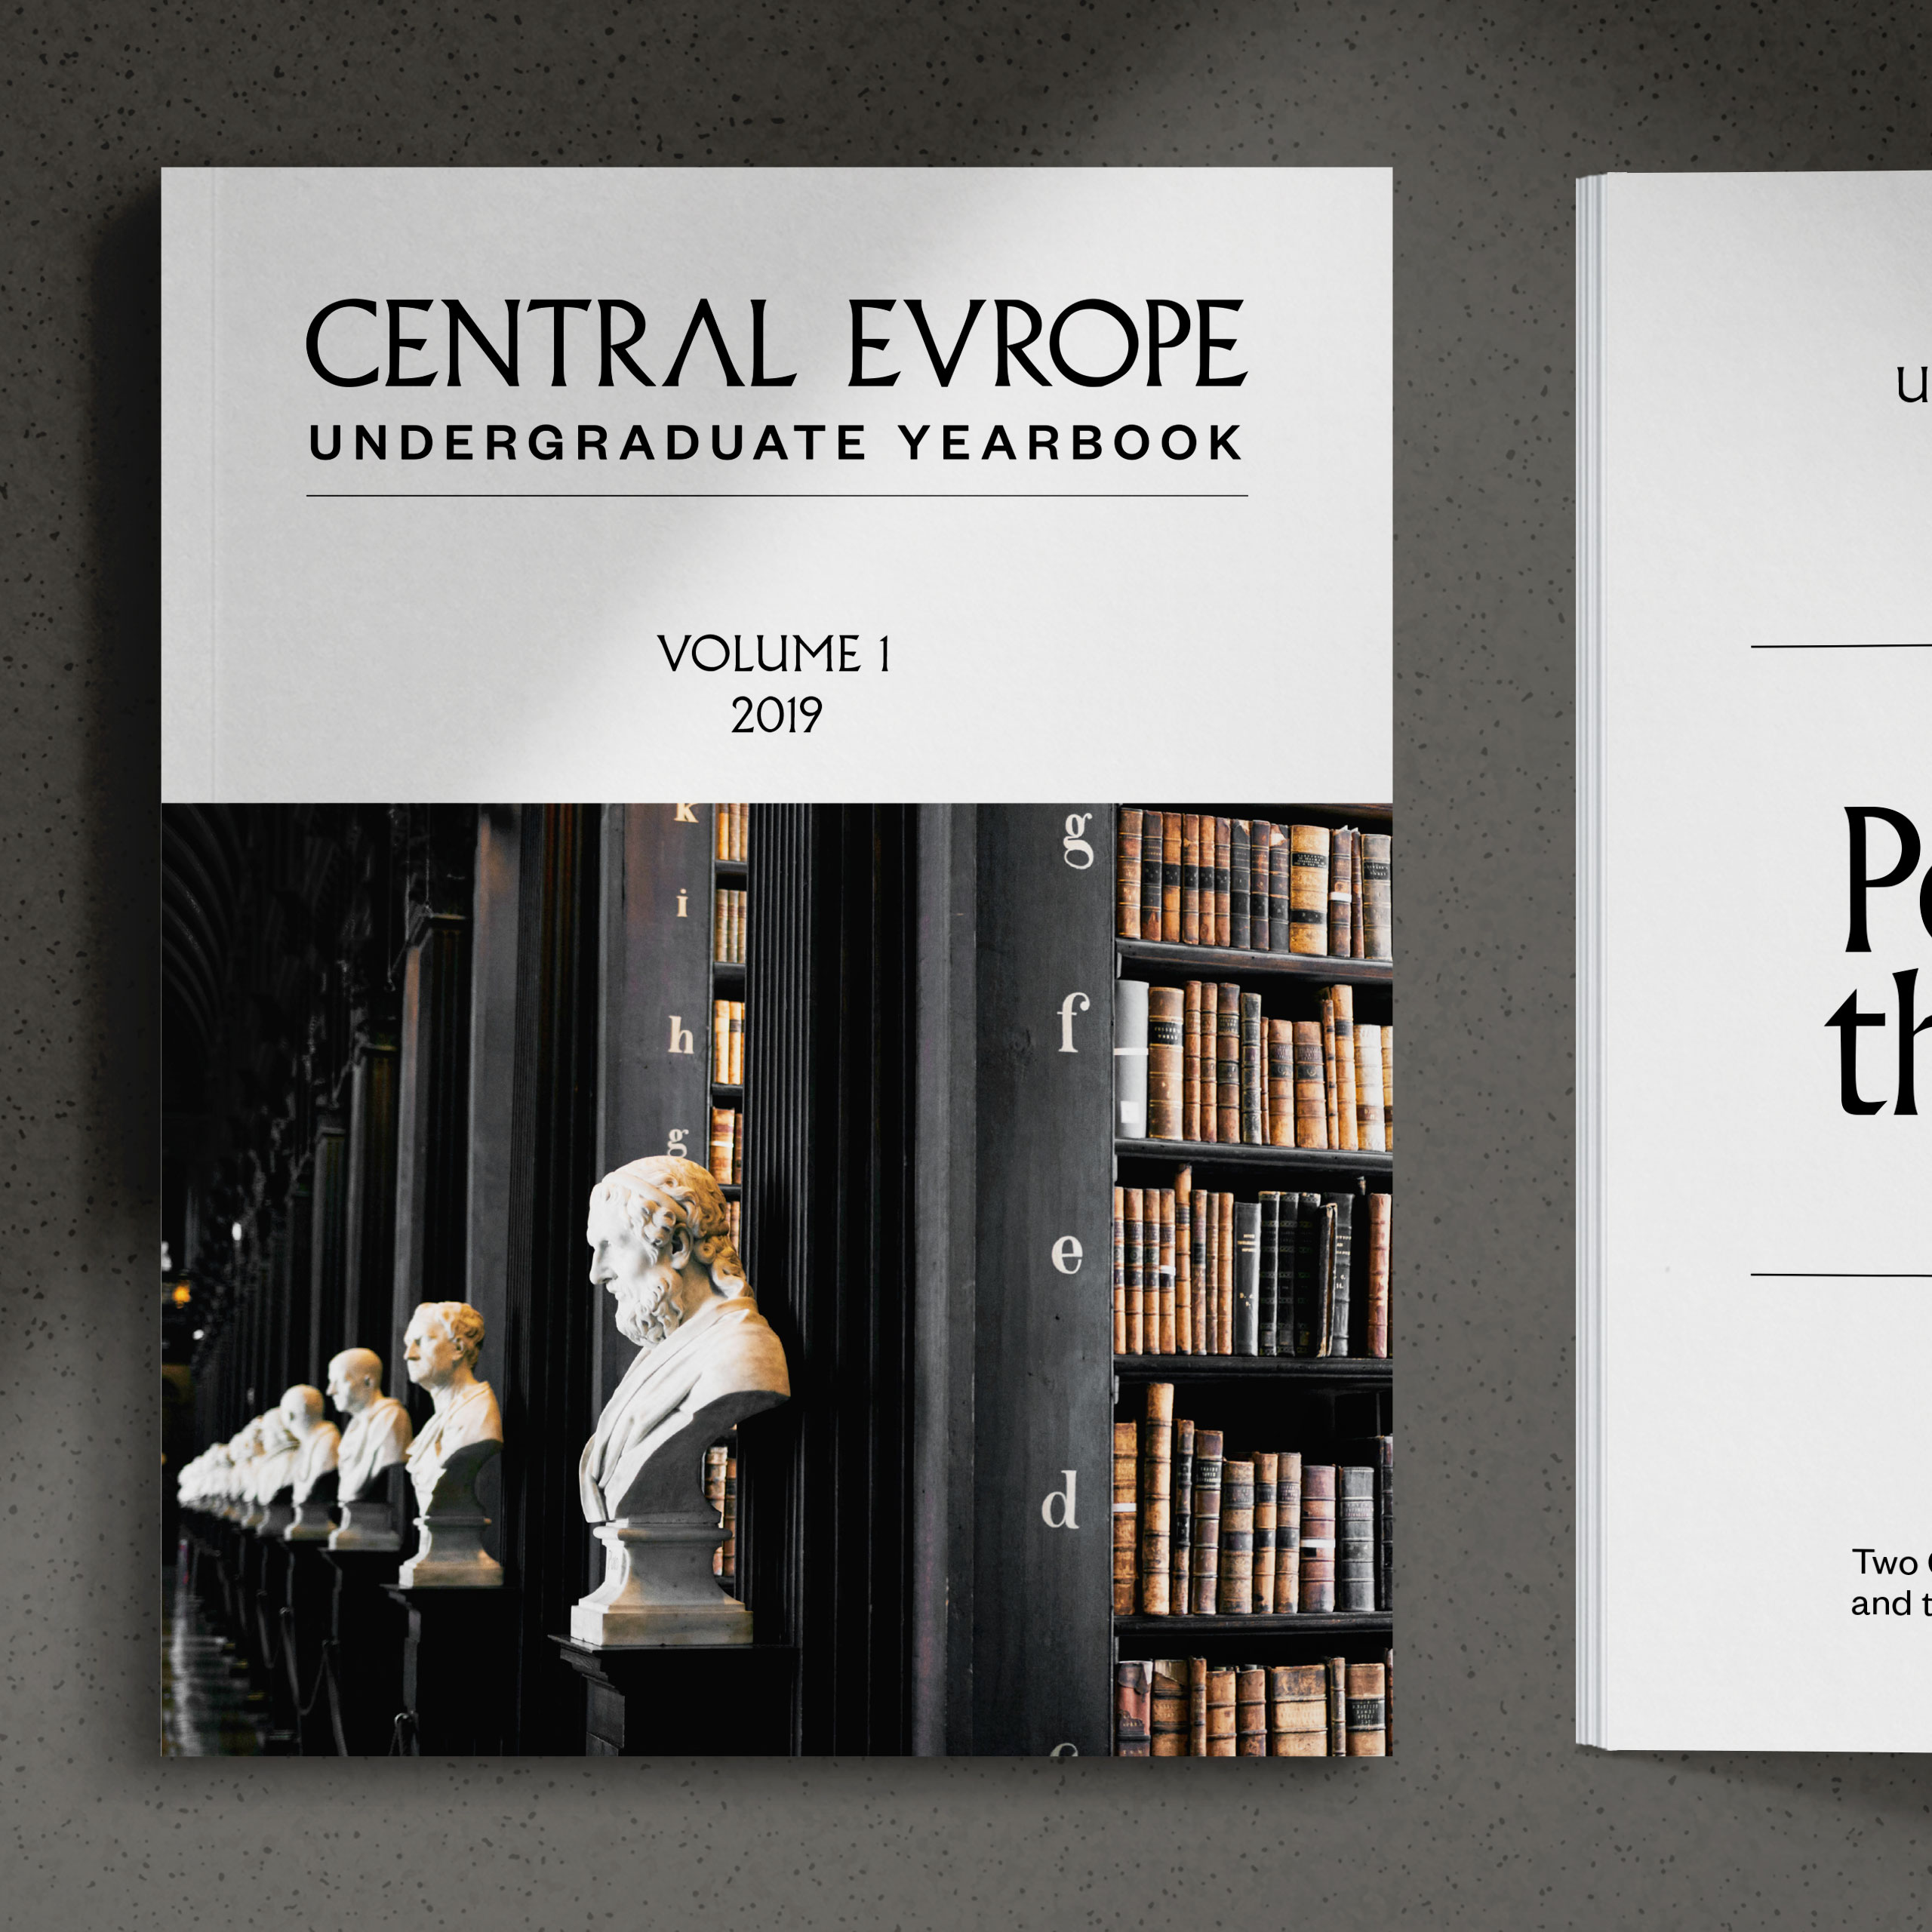 Central Europe Undergraduate Yearbook